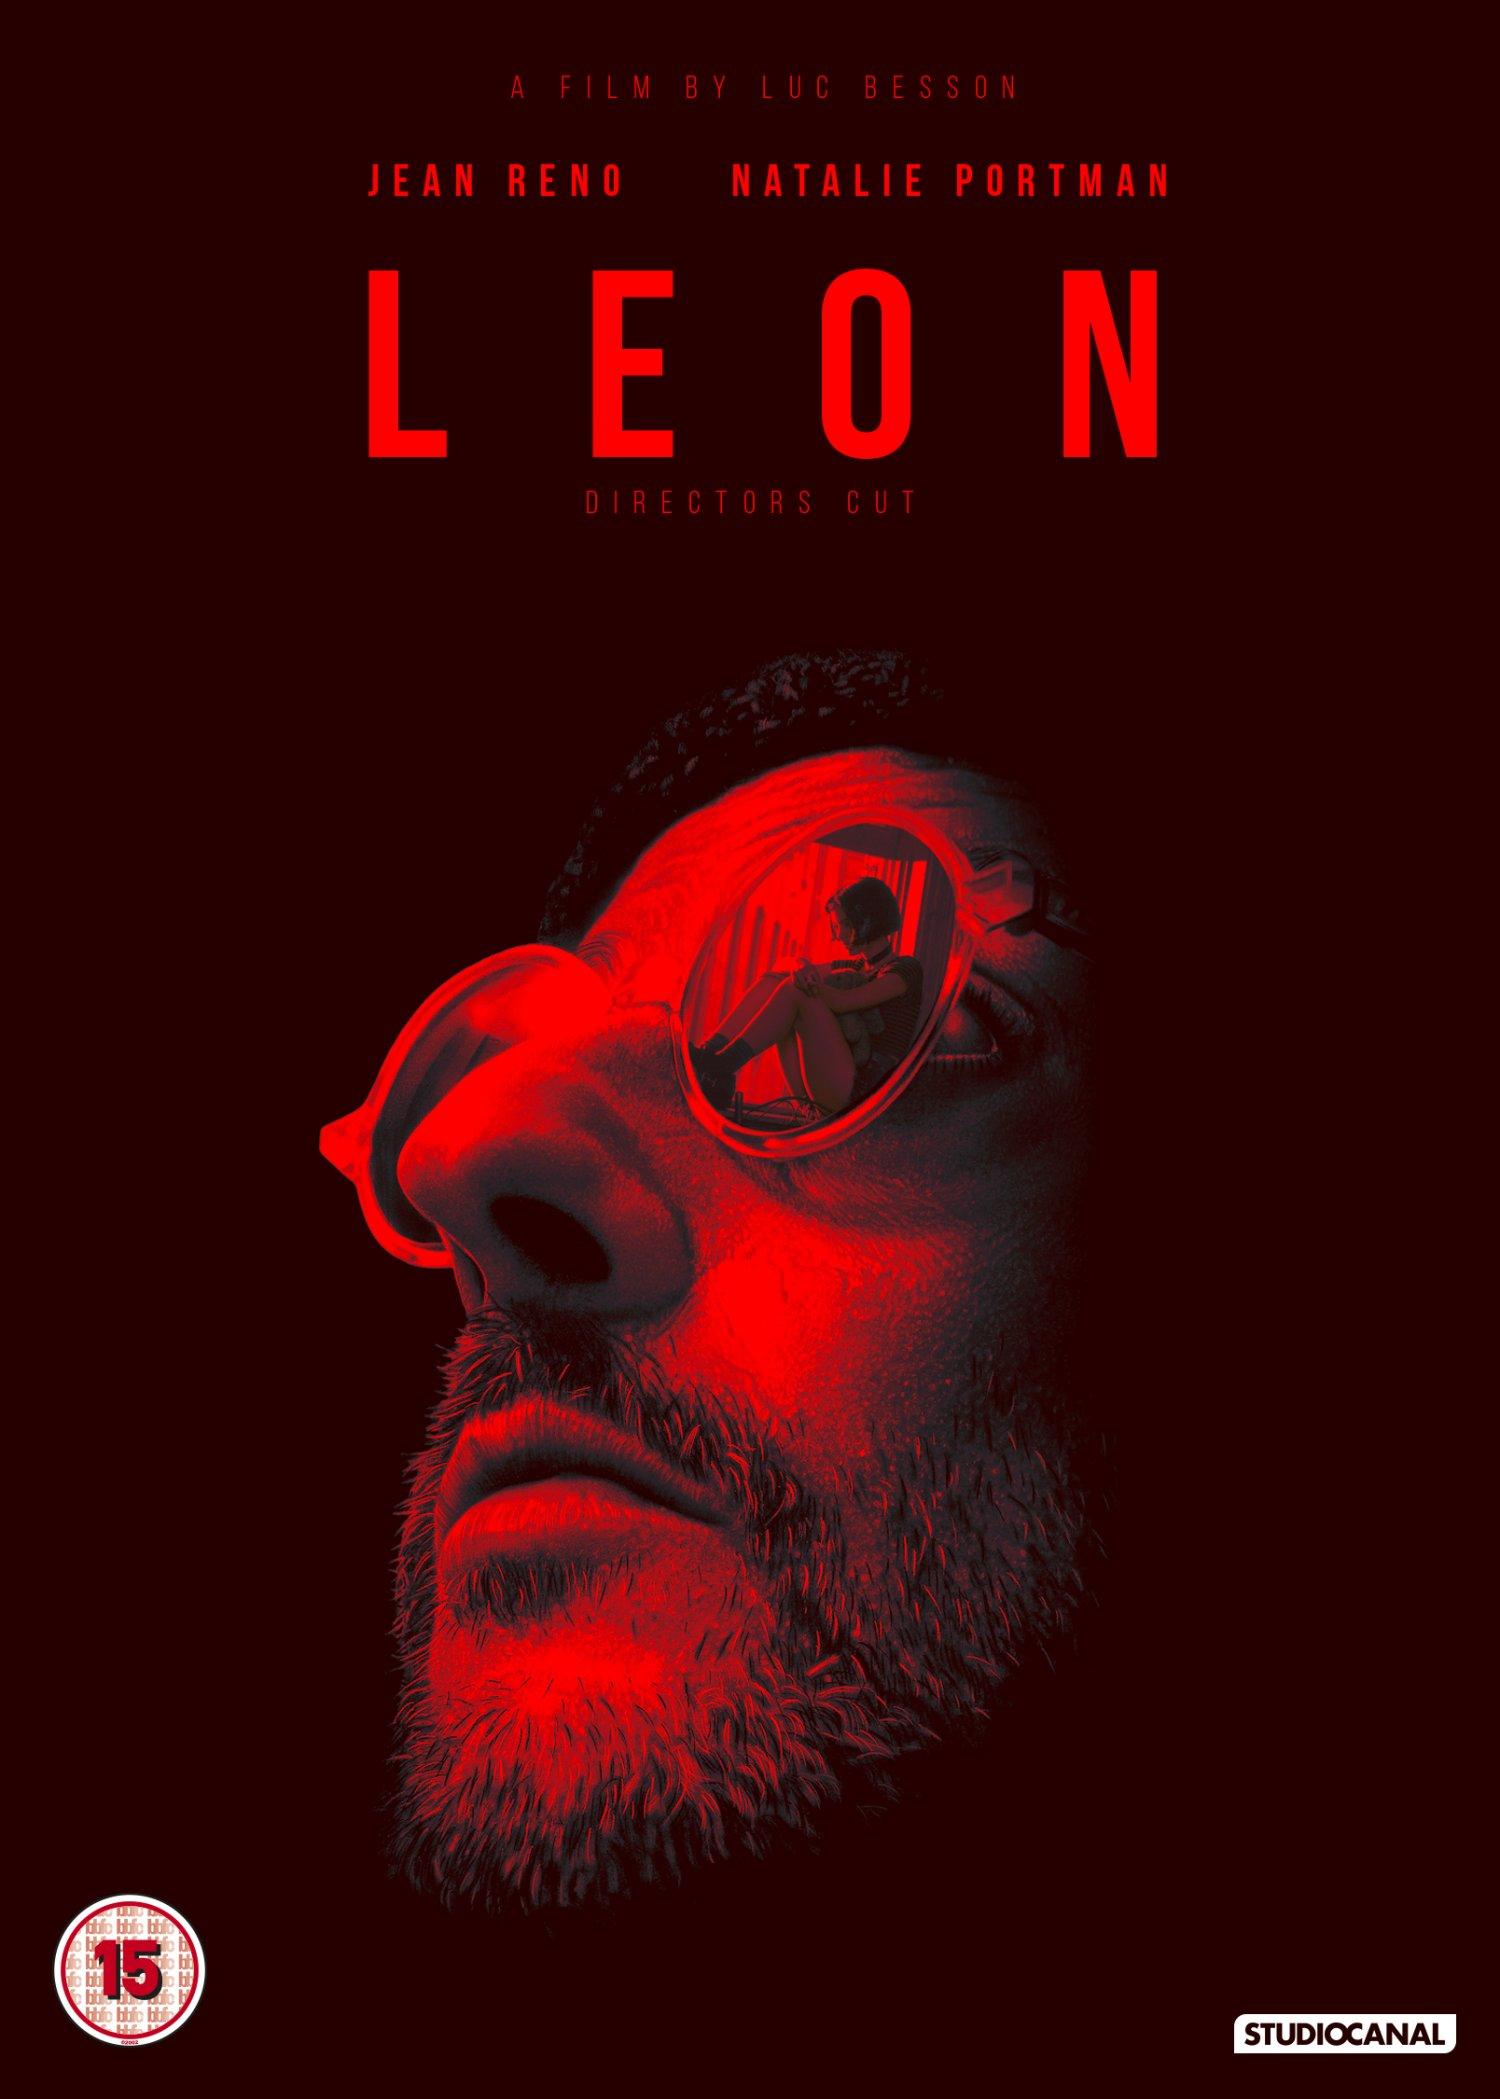 Leon_DVD_2D_O-Card